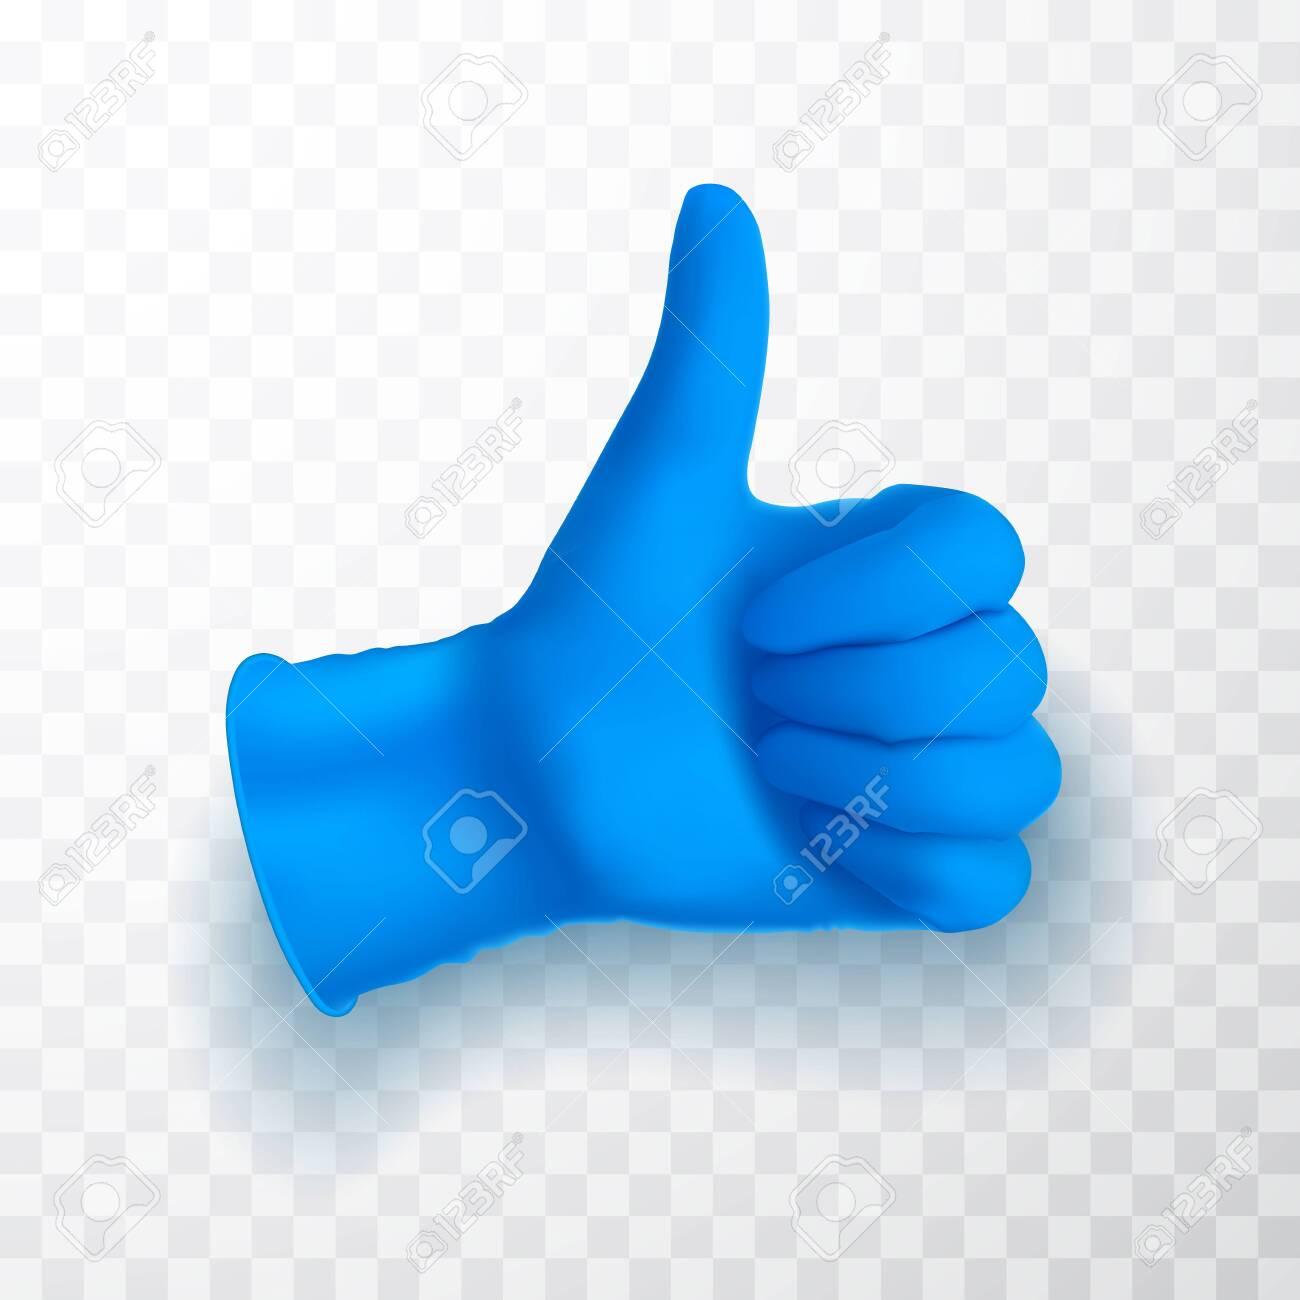 Ok, okay sing. Realistic medical latex glove. Details blue 3d medical glove. Vector illustration. - 145568006